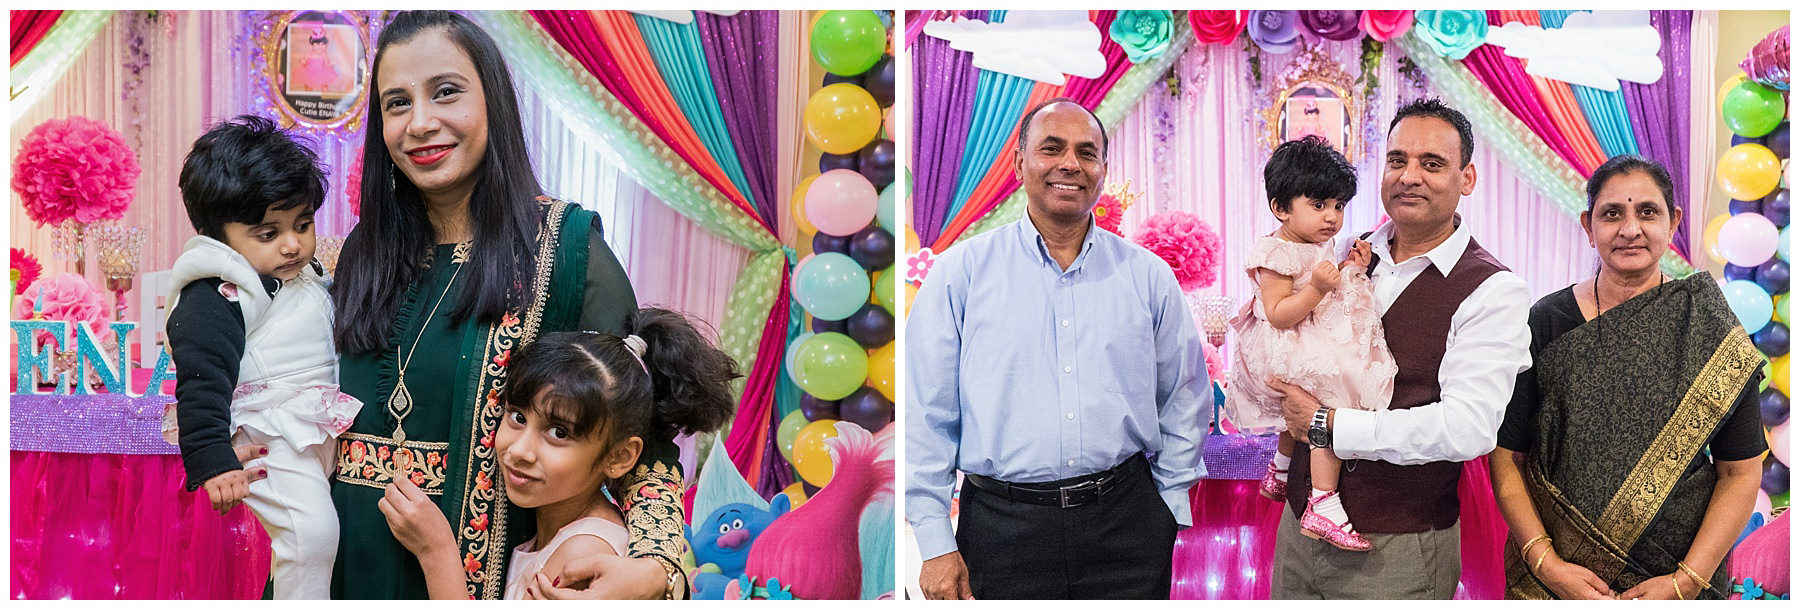 deewan-banquet-piscataway-nj-birthday-enanya-birthday-20.jpg